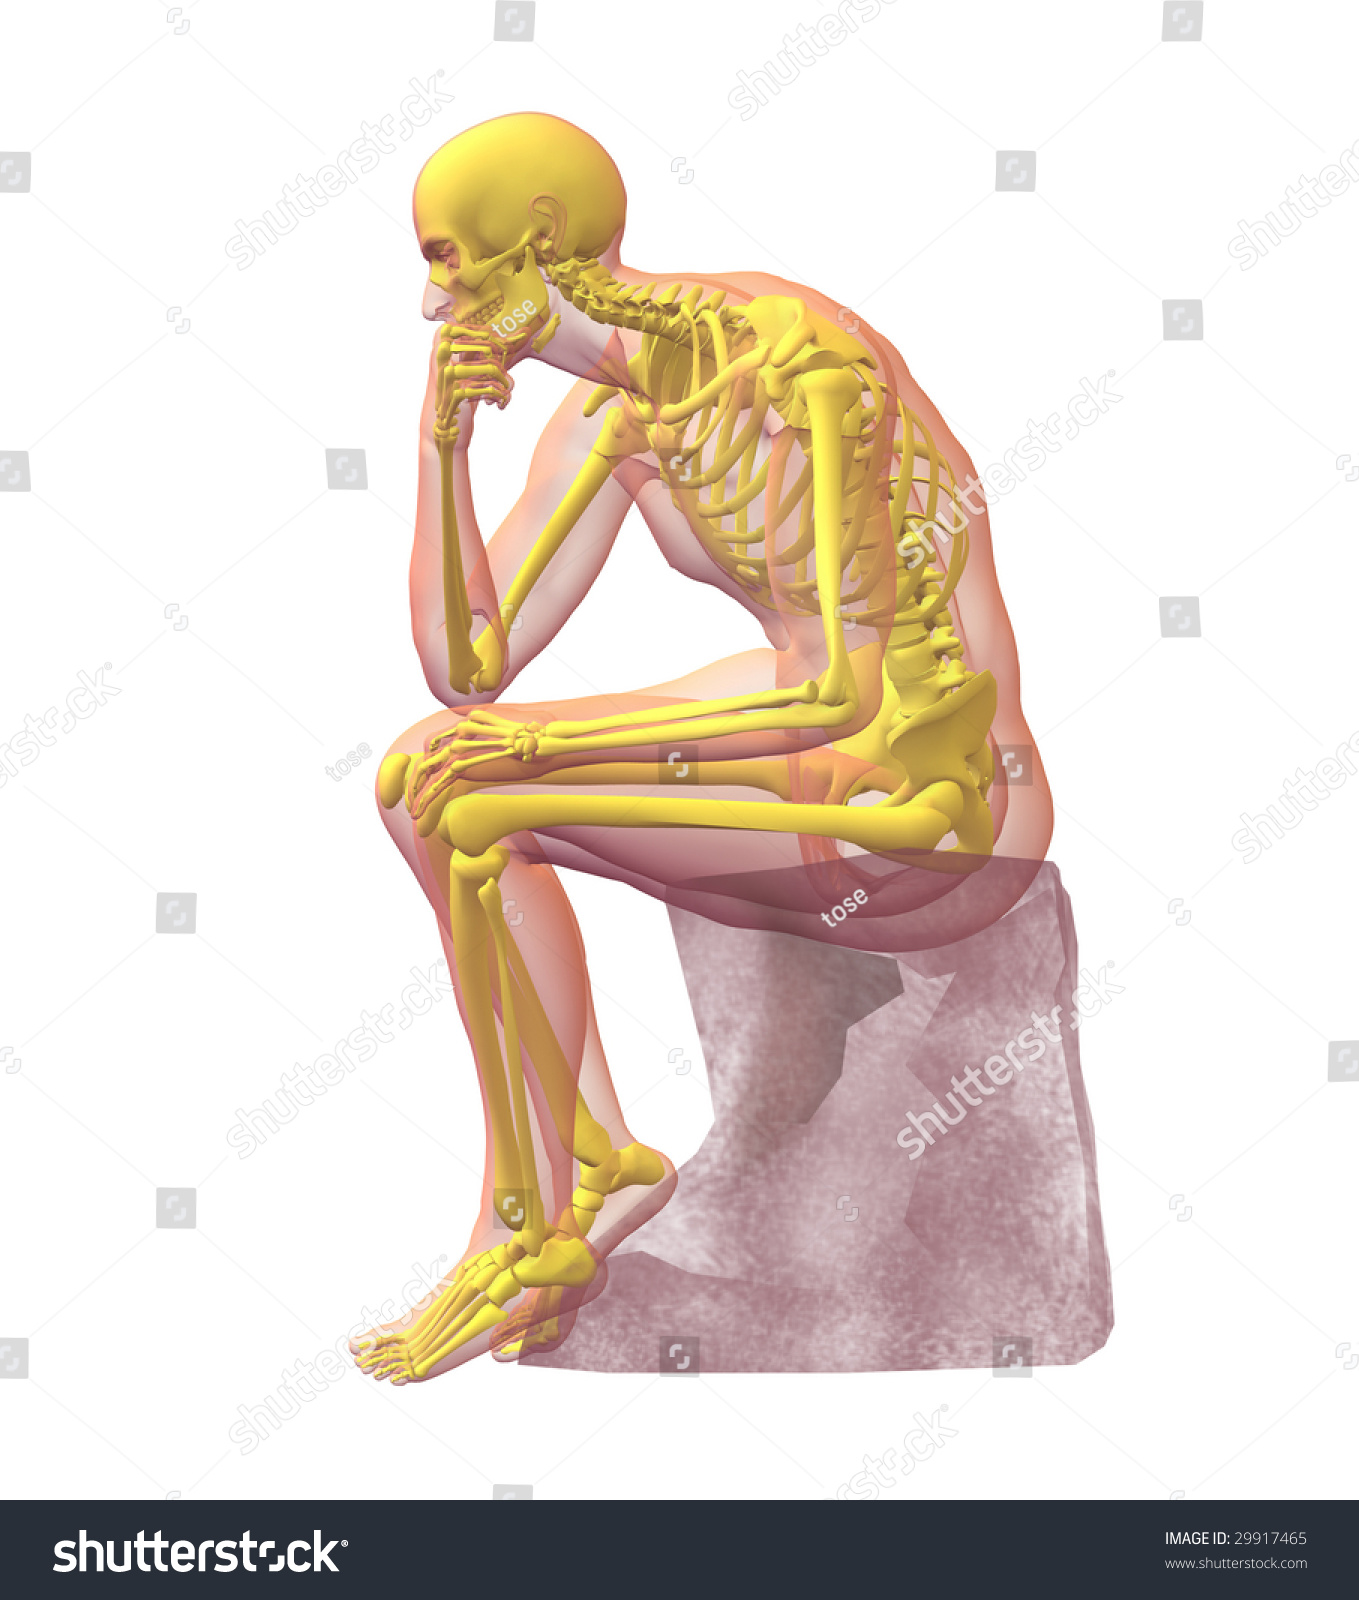 Xray Illustration Male Human Body Skeleton Stock Illustration